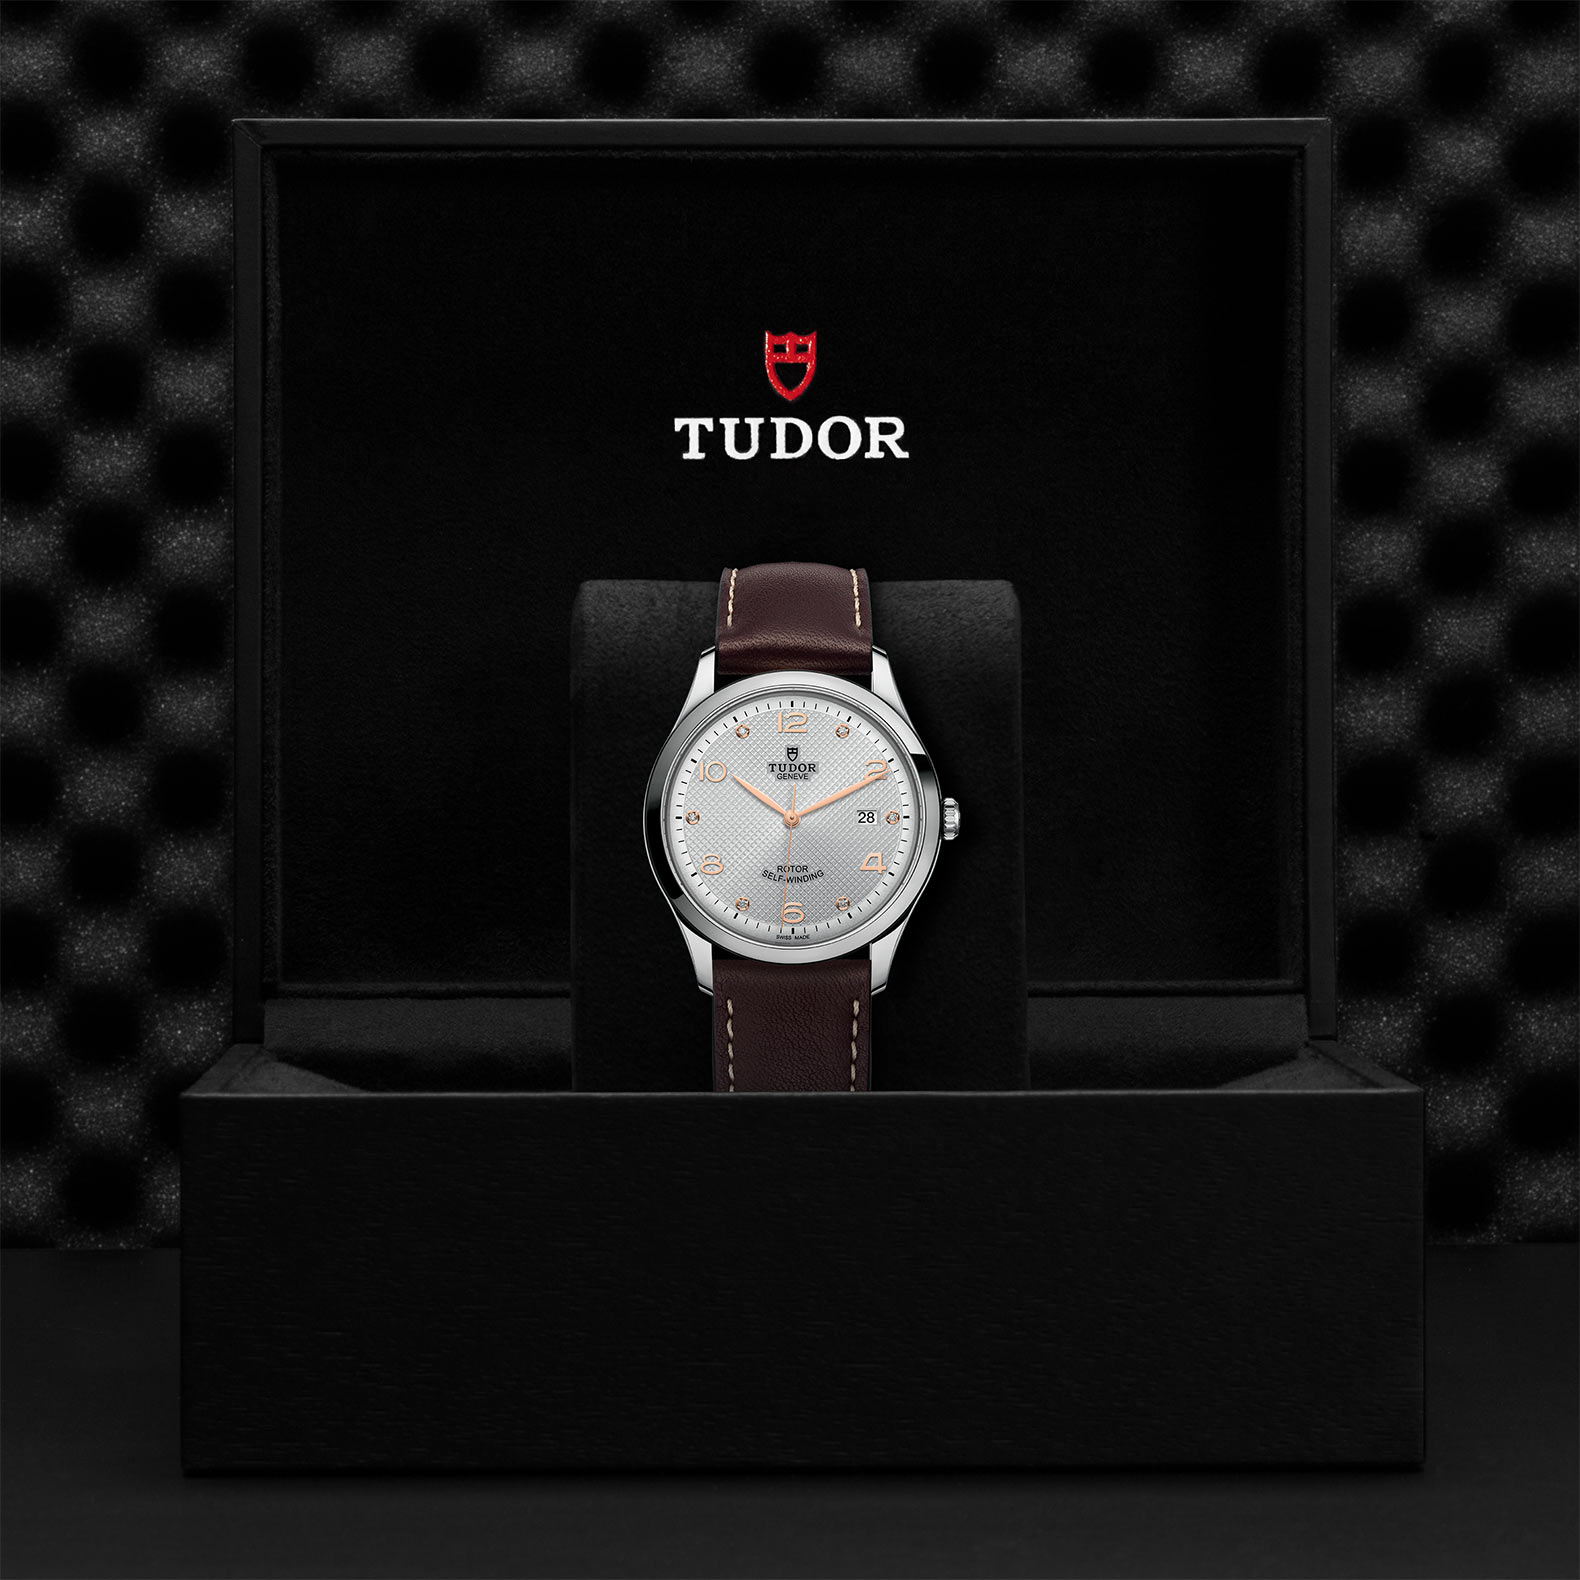 TUDOR 1926 - M91650-0007